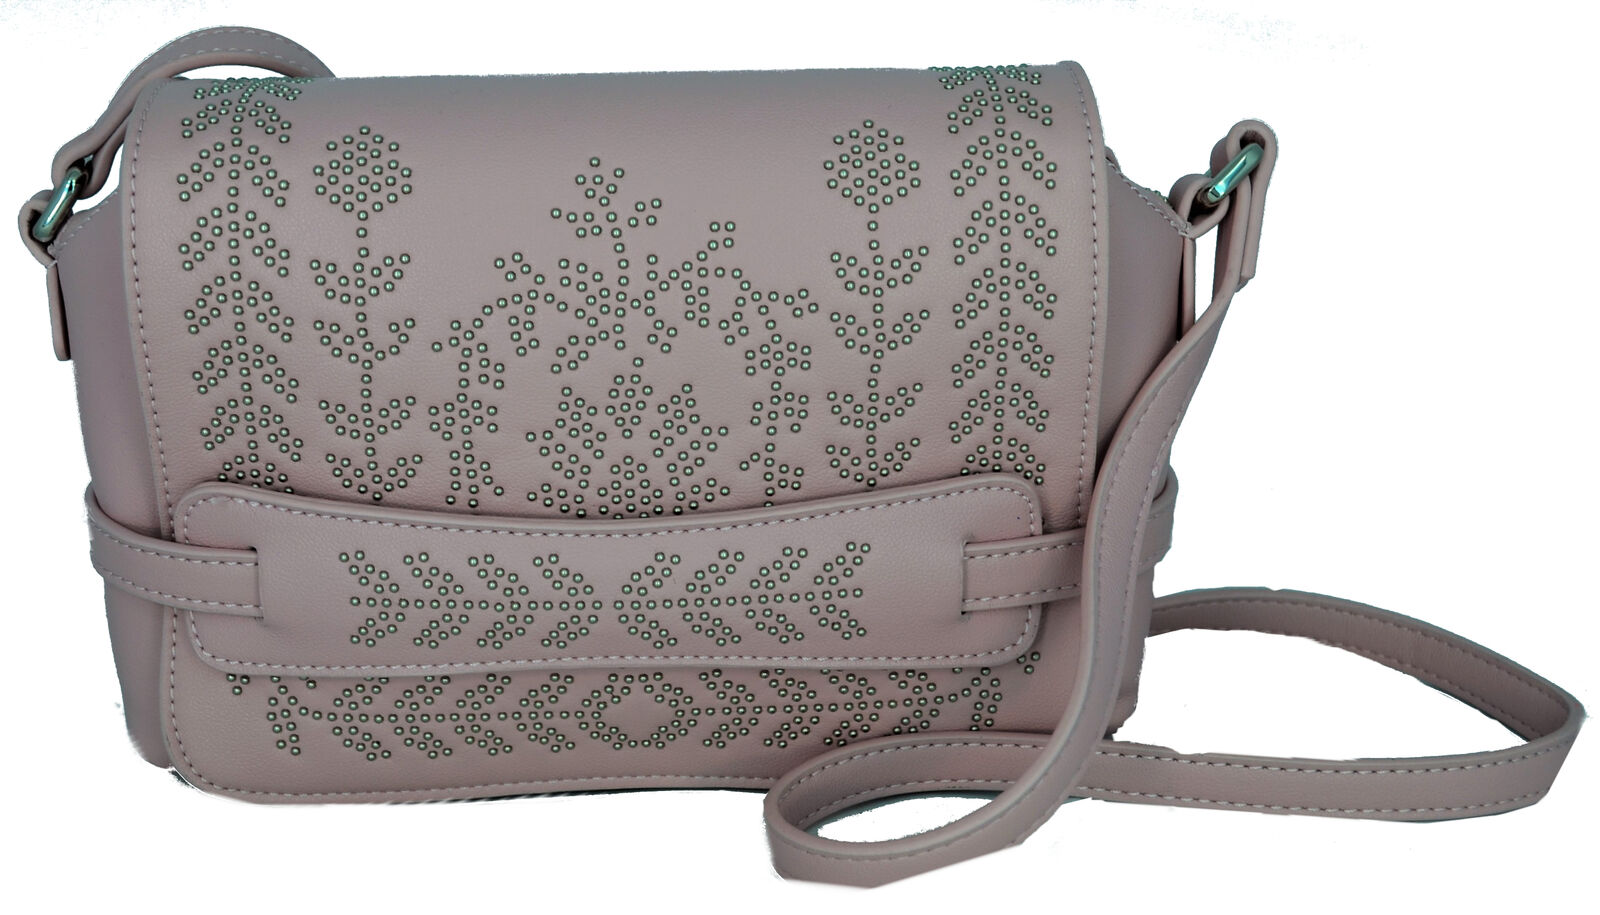 Tasche Handtasche damen Rosa Ermanno Scervino Bag Frau Rosa Linea Carolina Es